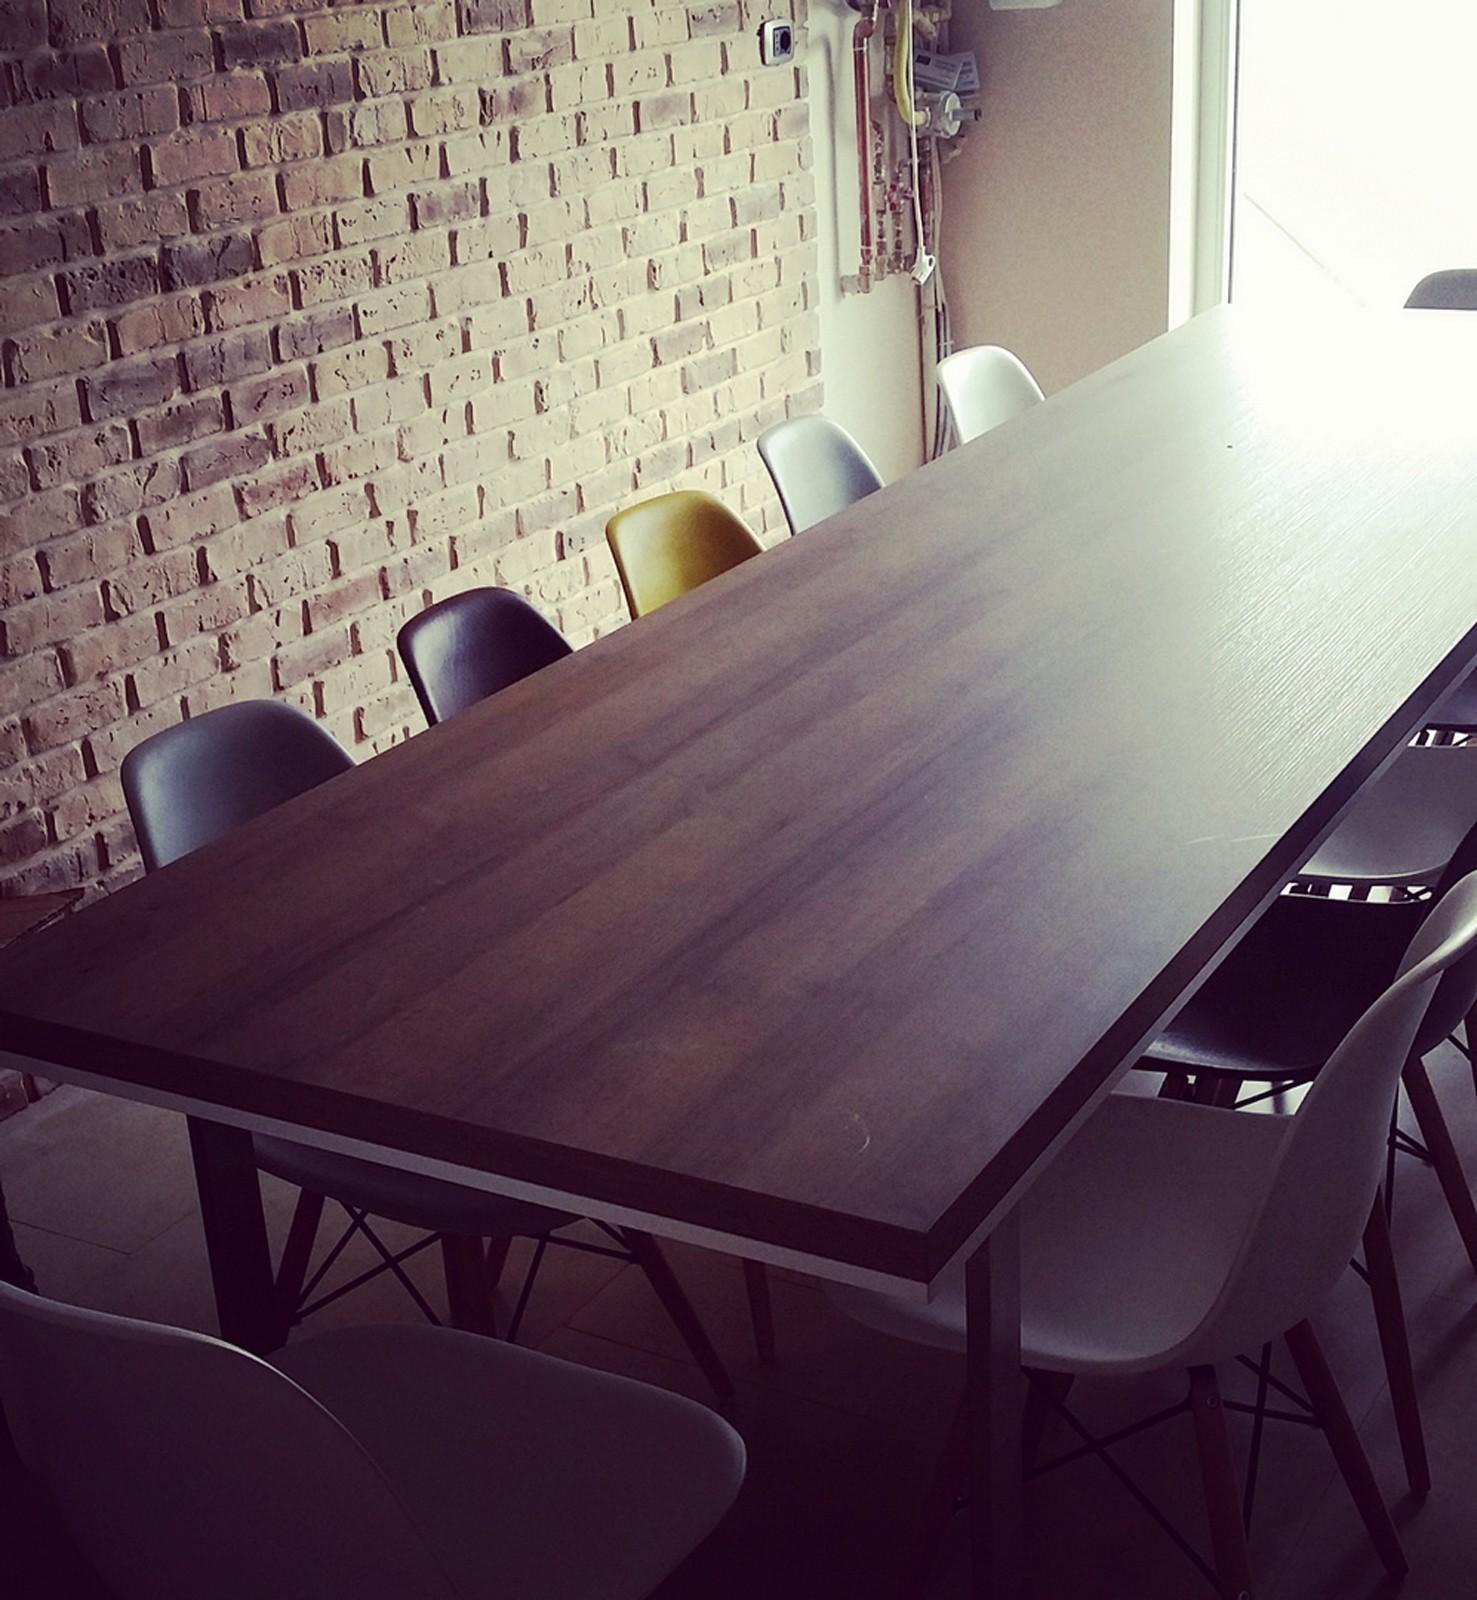 Referință - Masă dining modernă Nobilia - Stejar Ontario